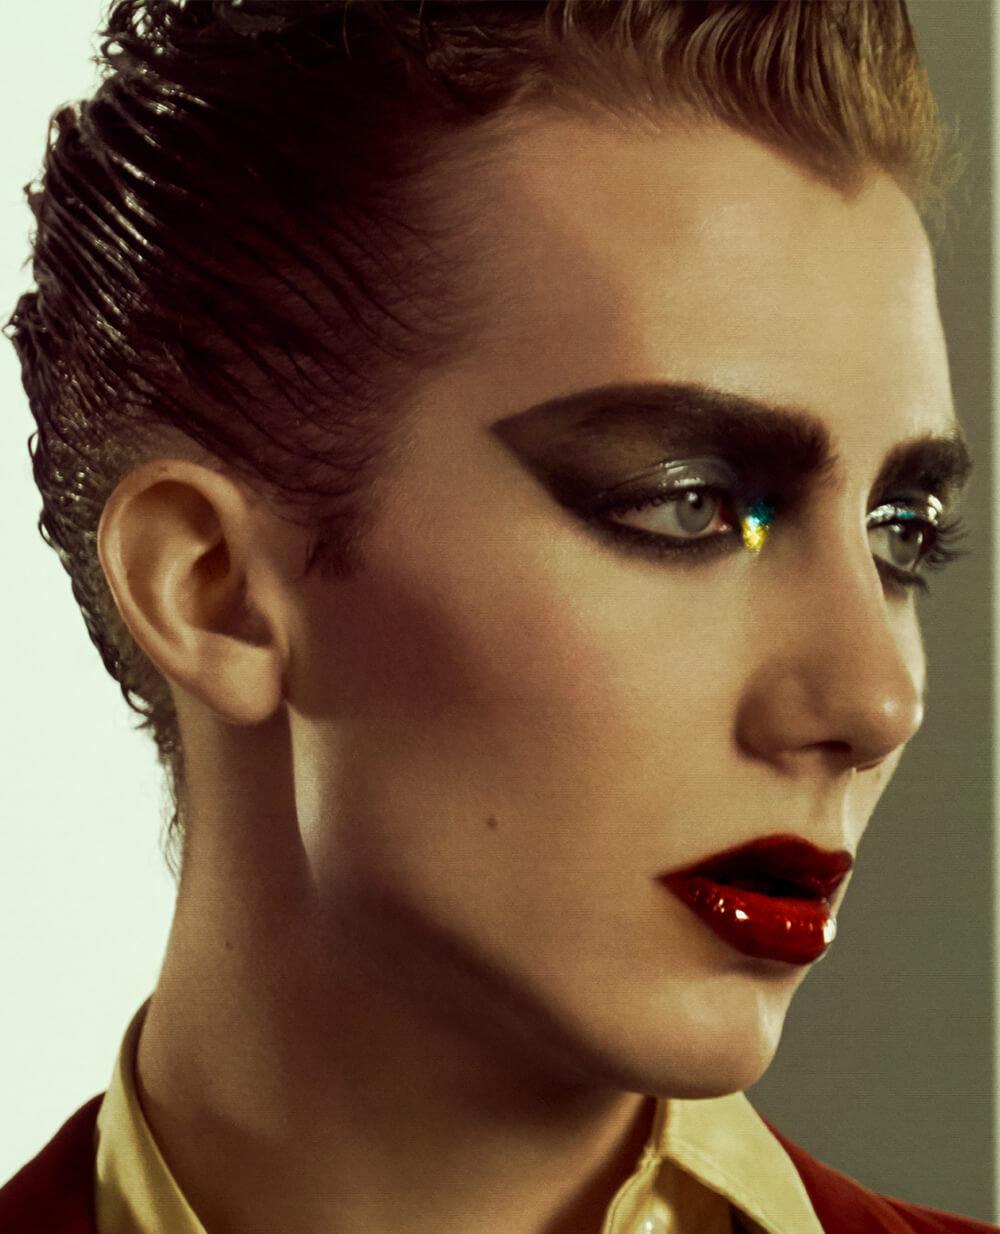 fa1f4857730 Paul Hameline wears PAT McGRATH LABS – Mothership I Eyeshadow Palette  Subliminal, Skin Fetish: Highlighter & Balm Duo, Permagel Ultra Glide Eye  Pencil, ...